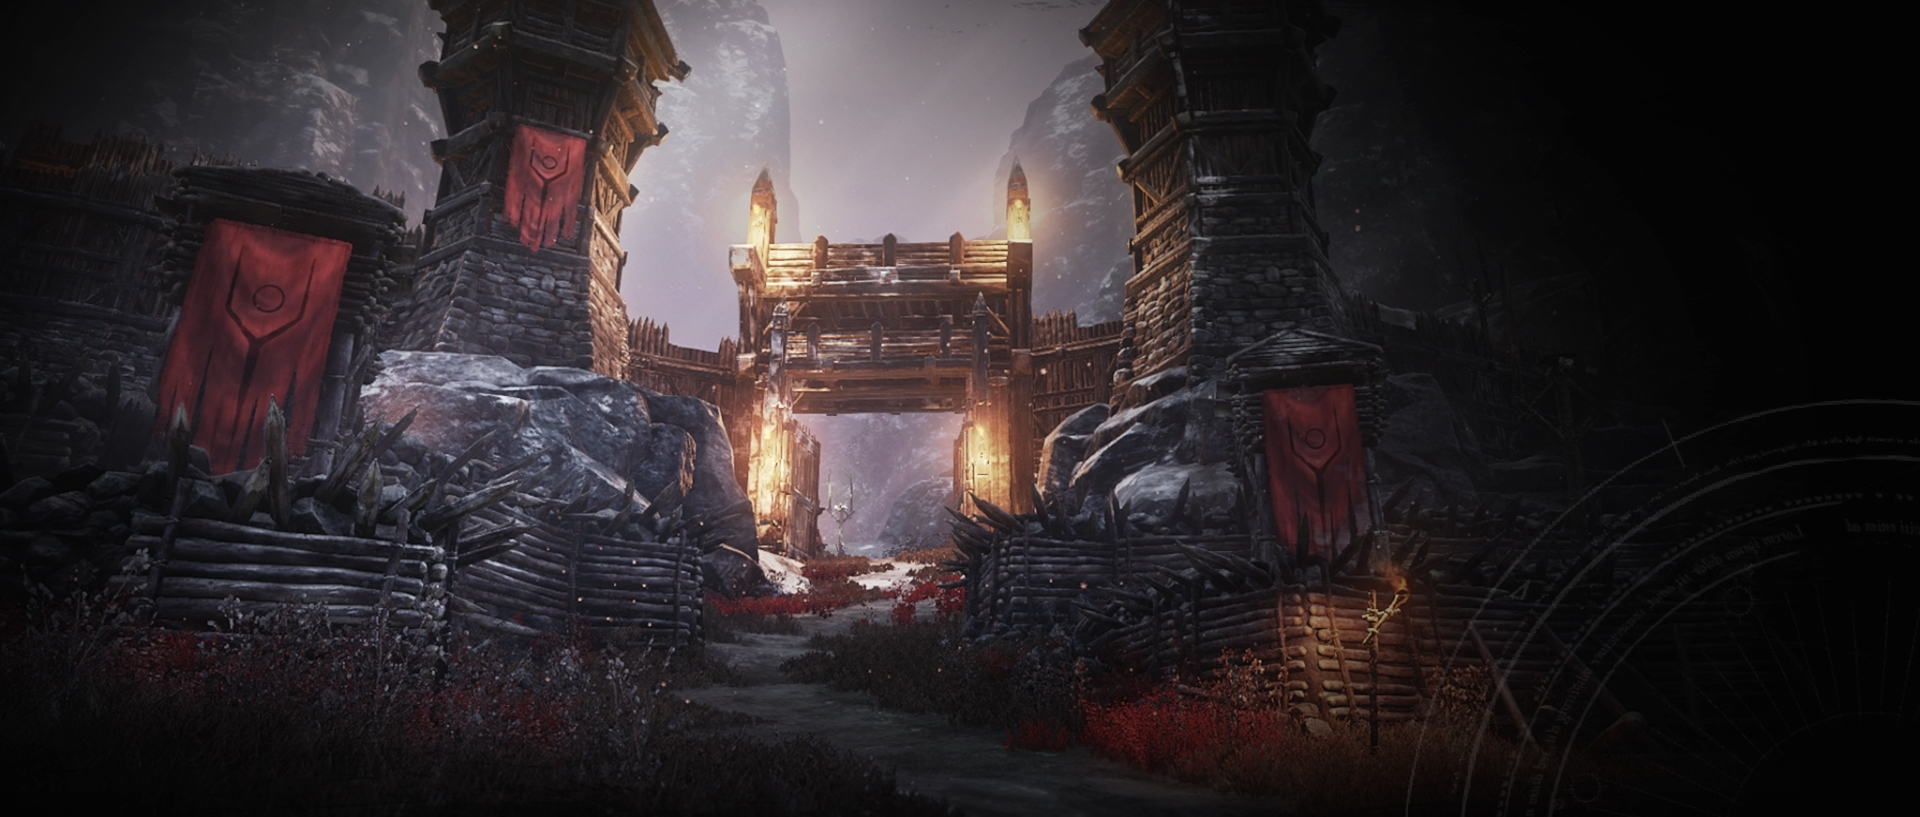 How Combat works in New World - A Beginner's Guide - VULKK.com